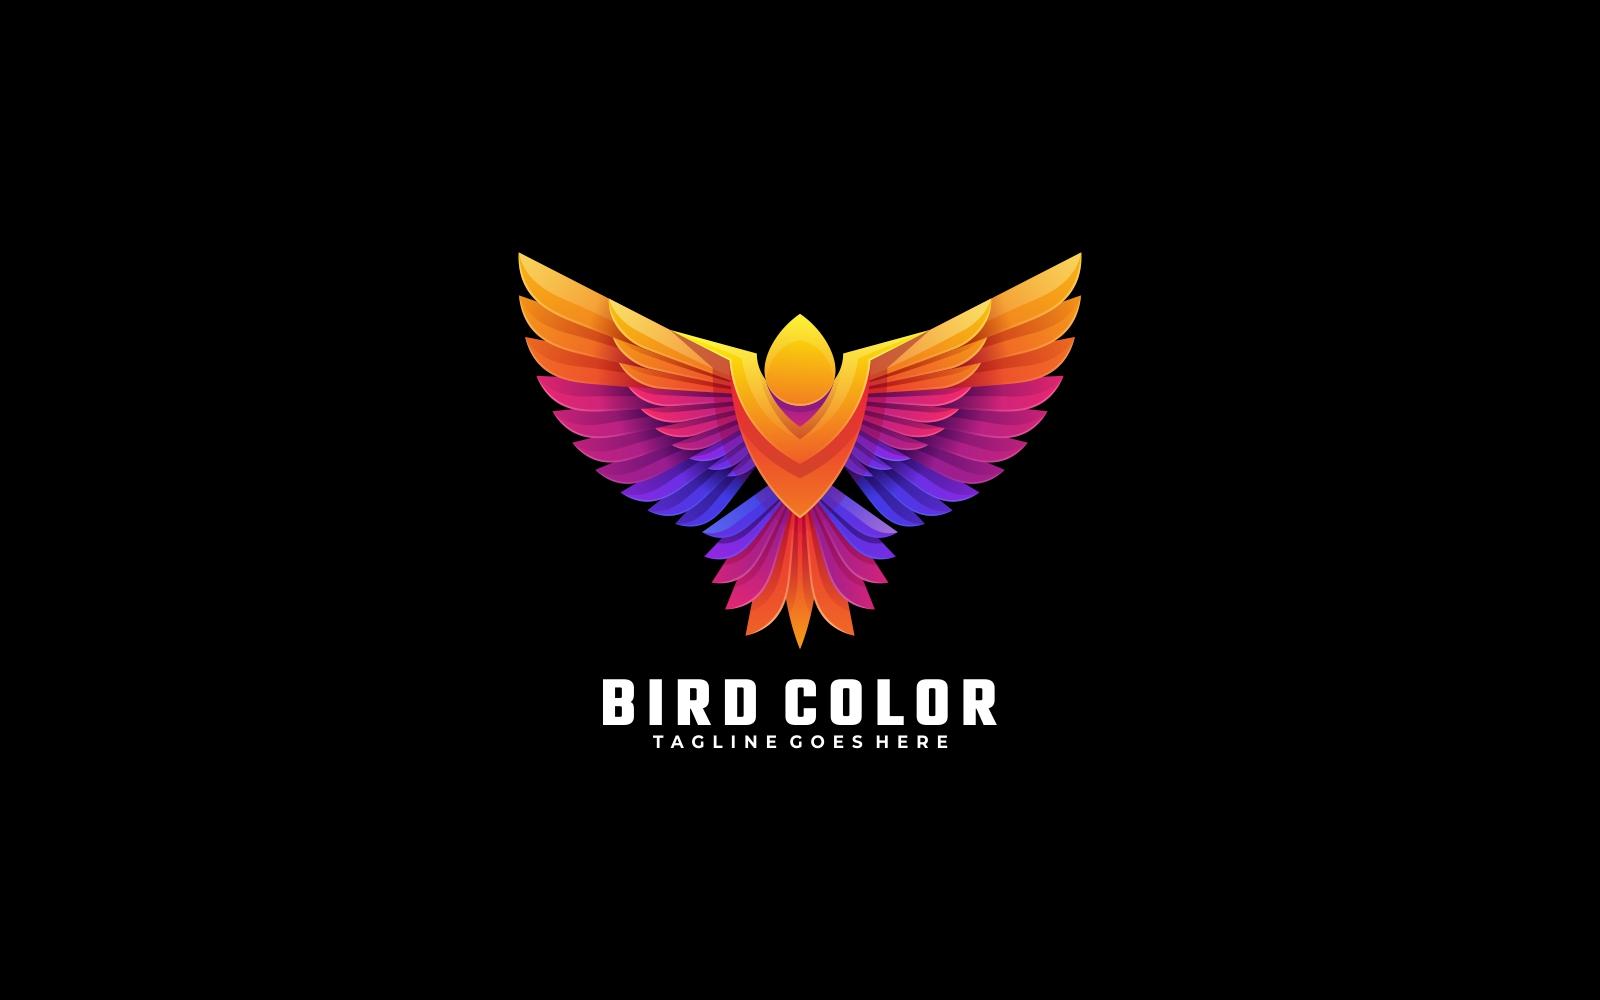 Bird Gradient Colorful Logo Style